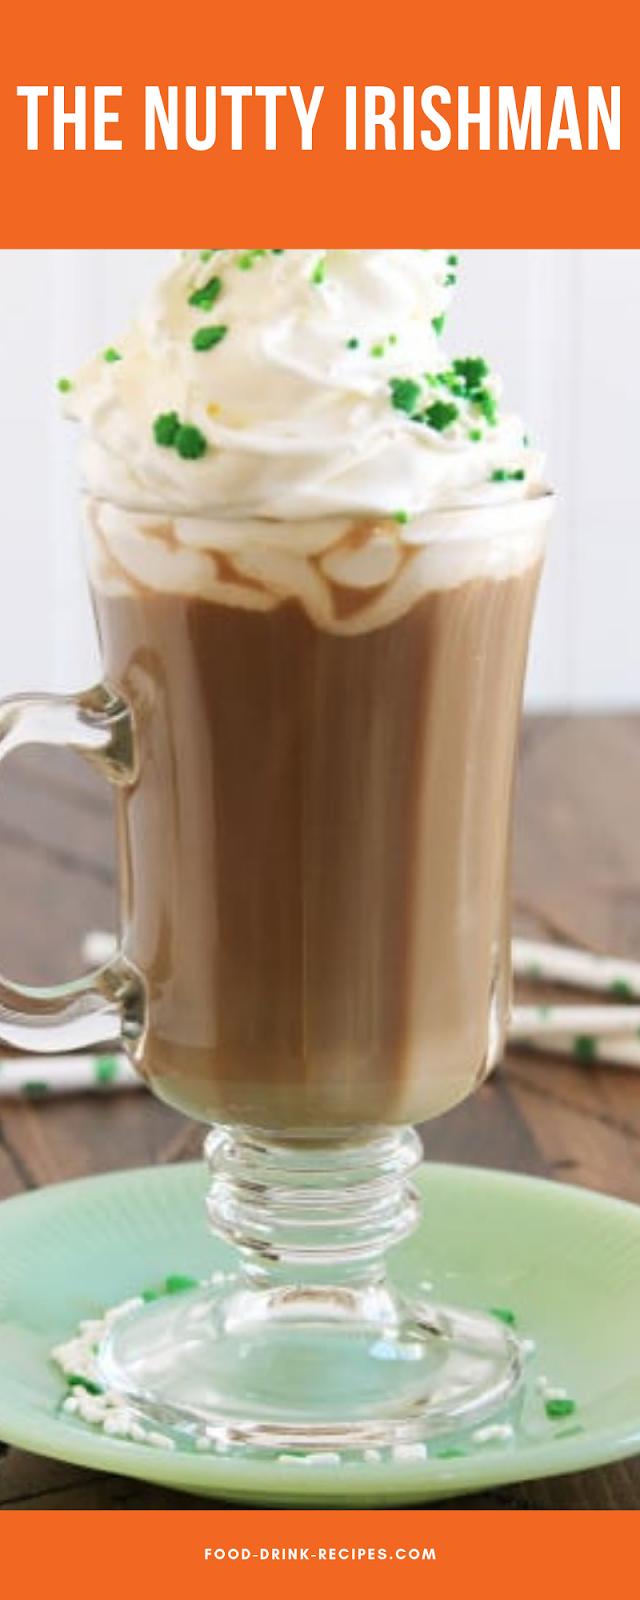 The Nutty Irishman - food-drink-recipes.com